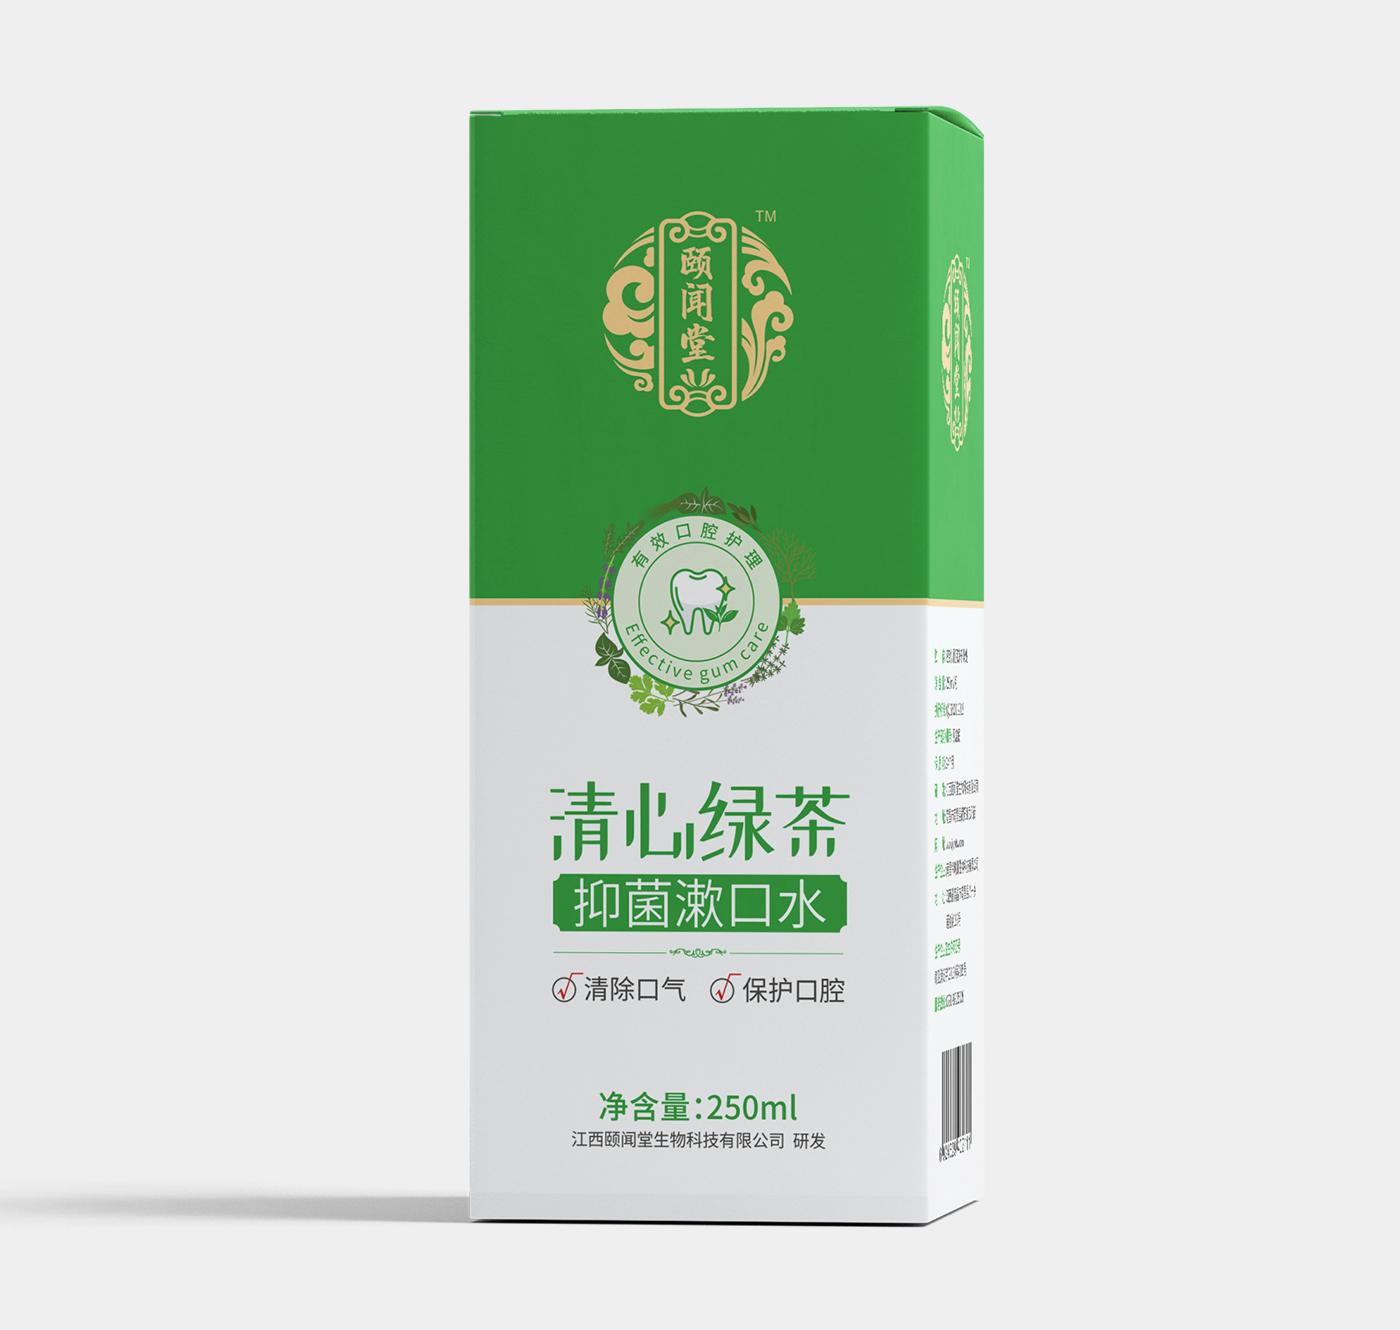 title='清心绿茶抑菌漱口水'